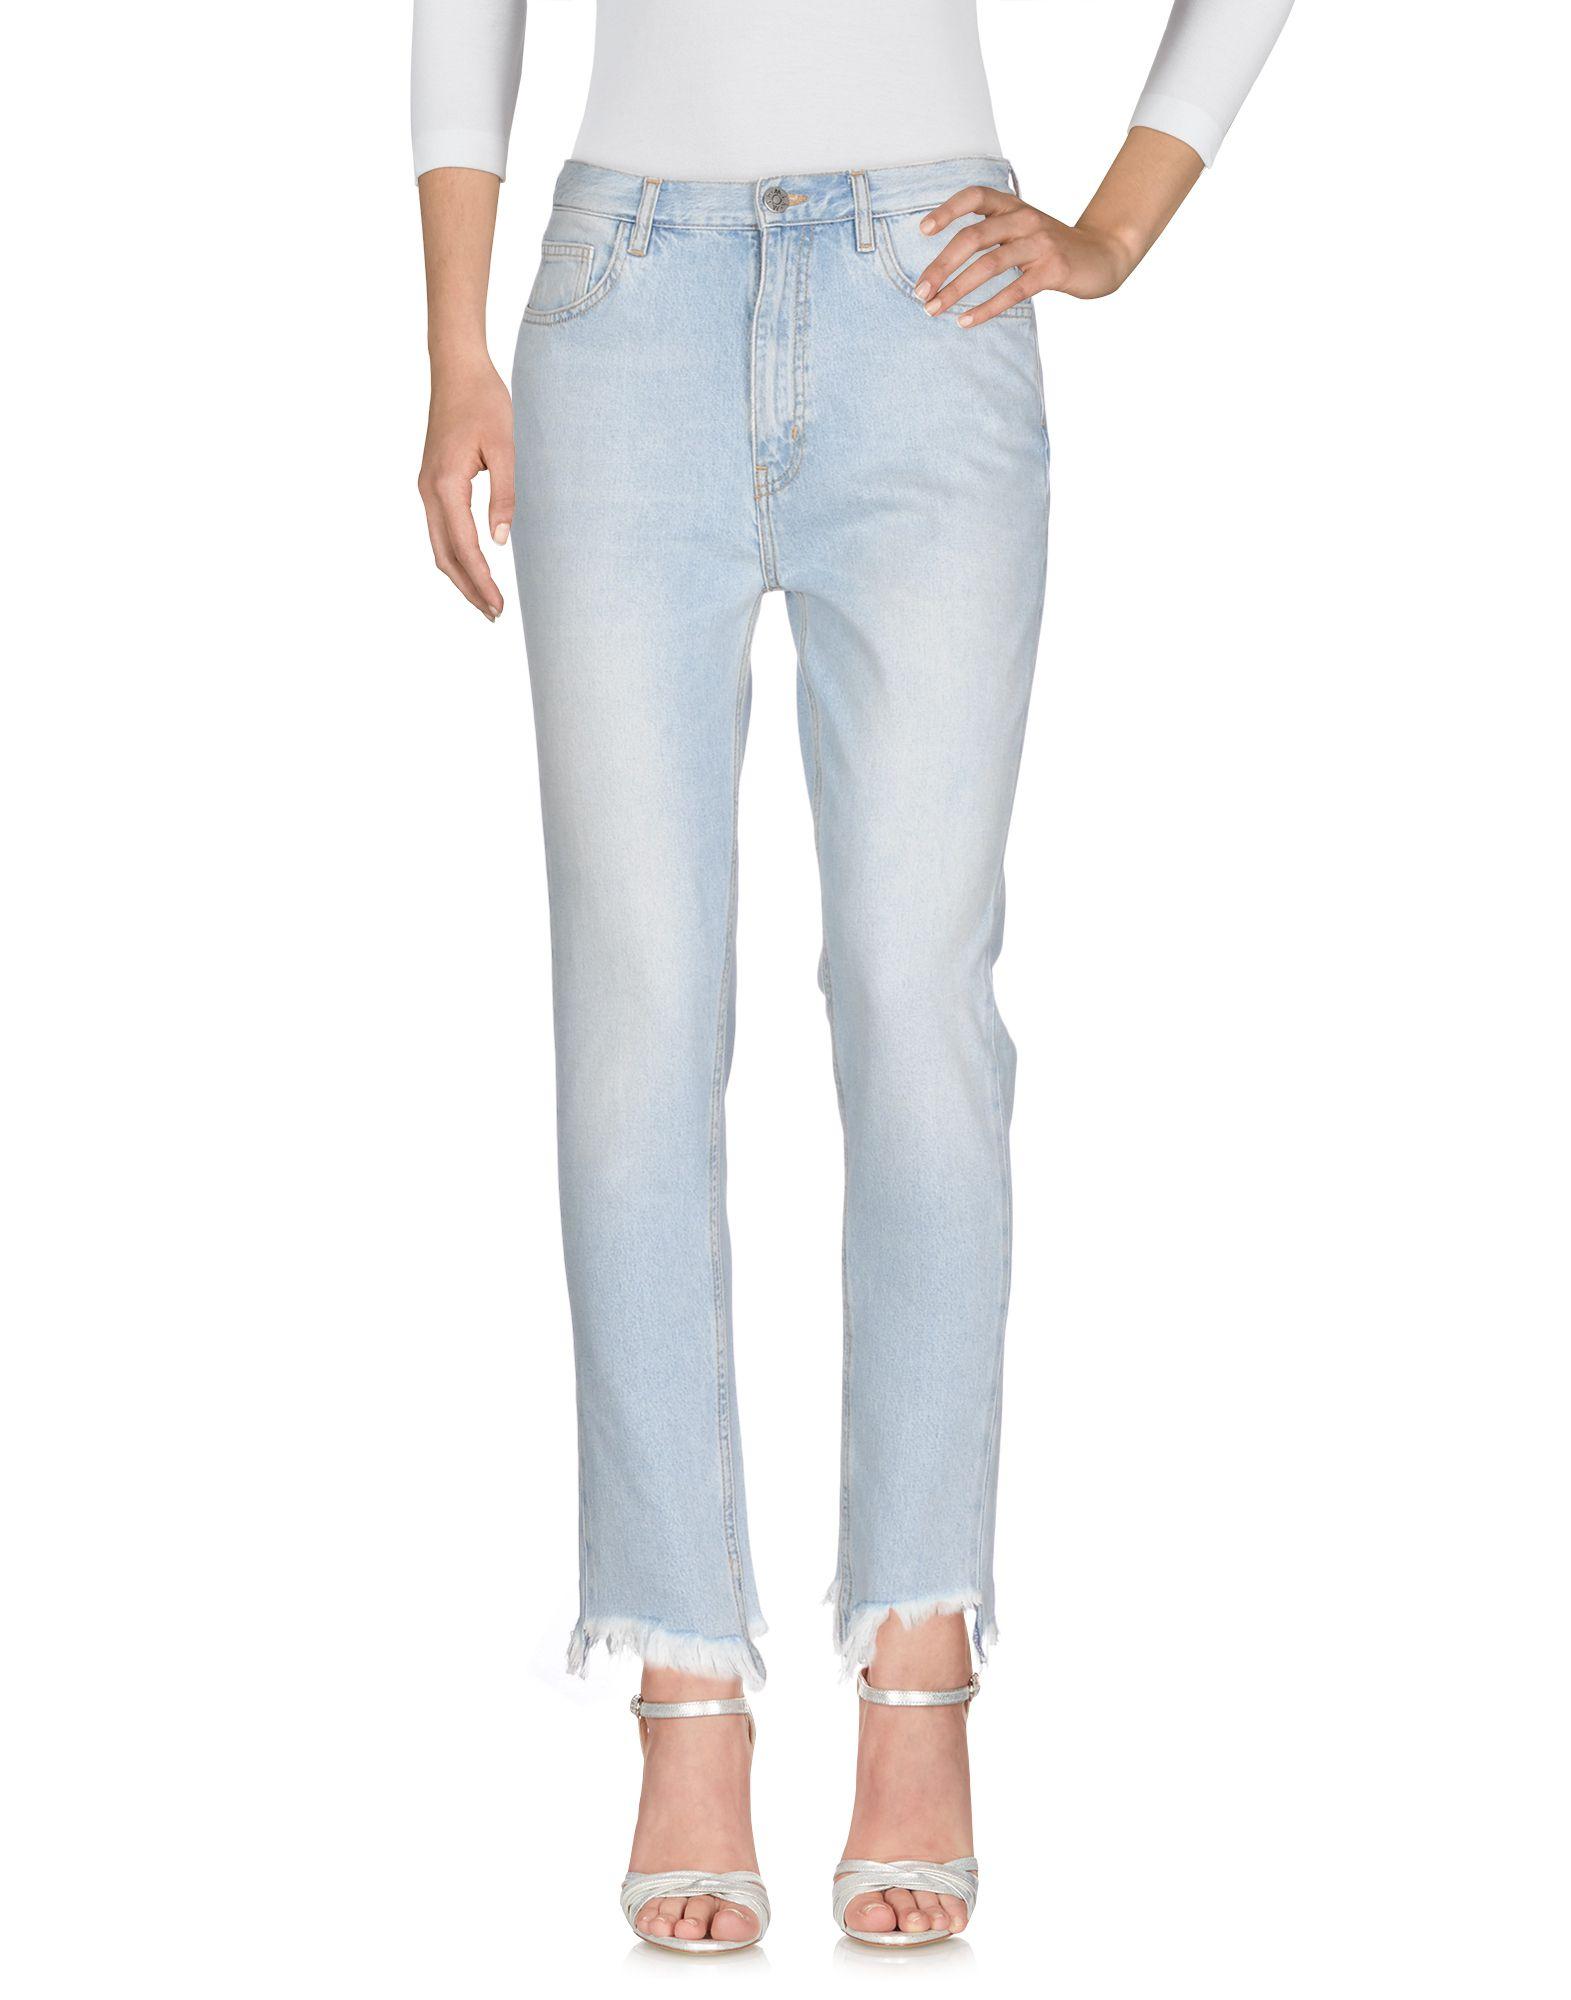 Pantaloni Jeans M.I.H Jeans Donna - Acquista online su